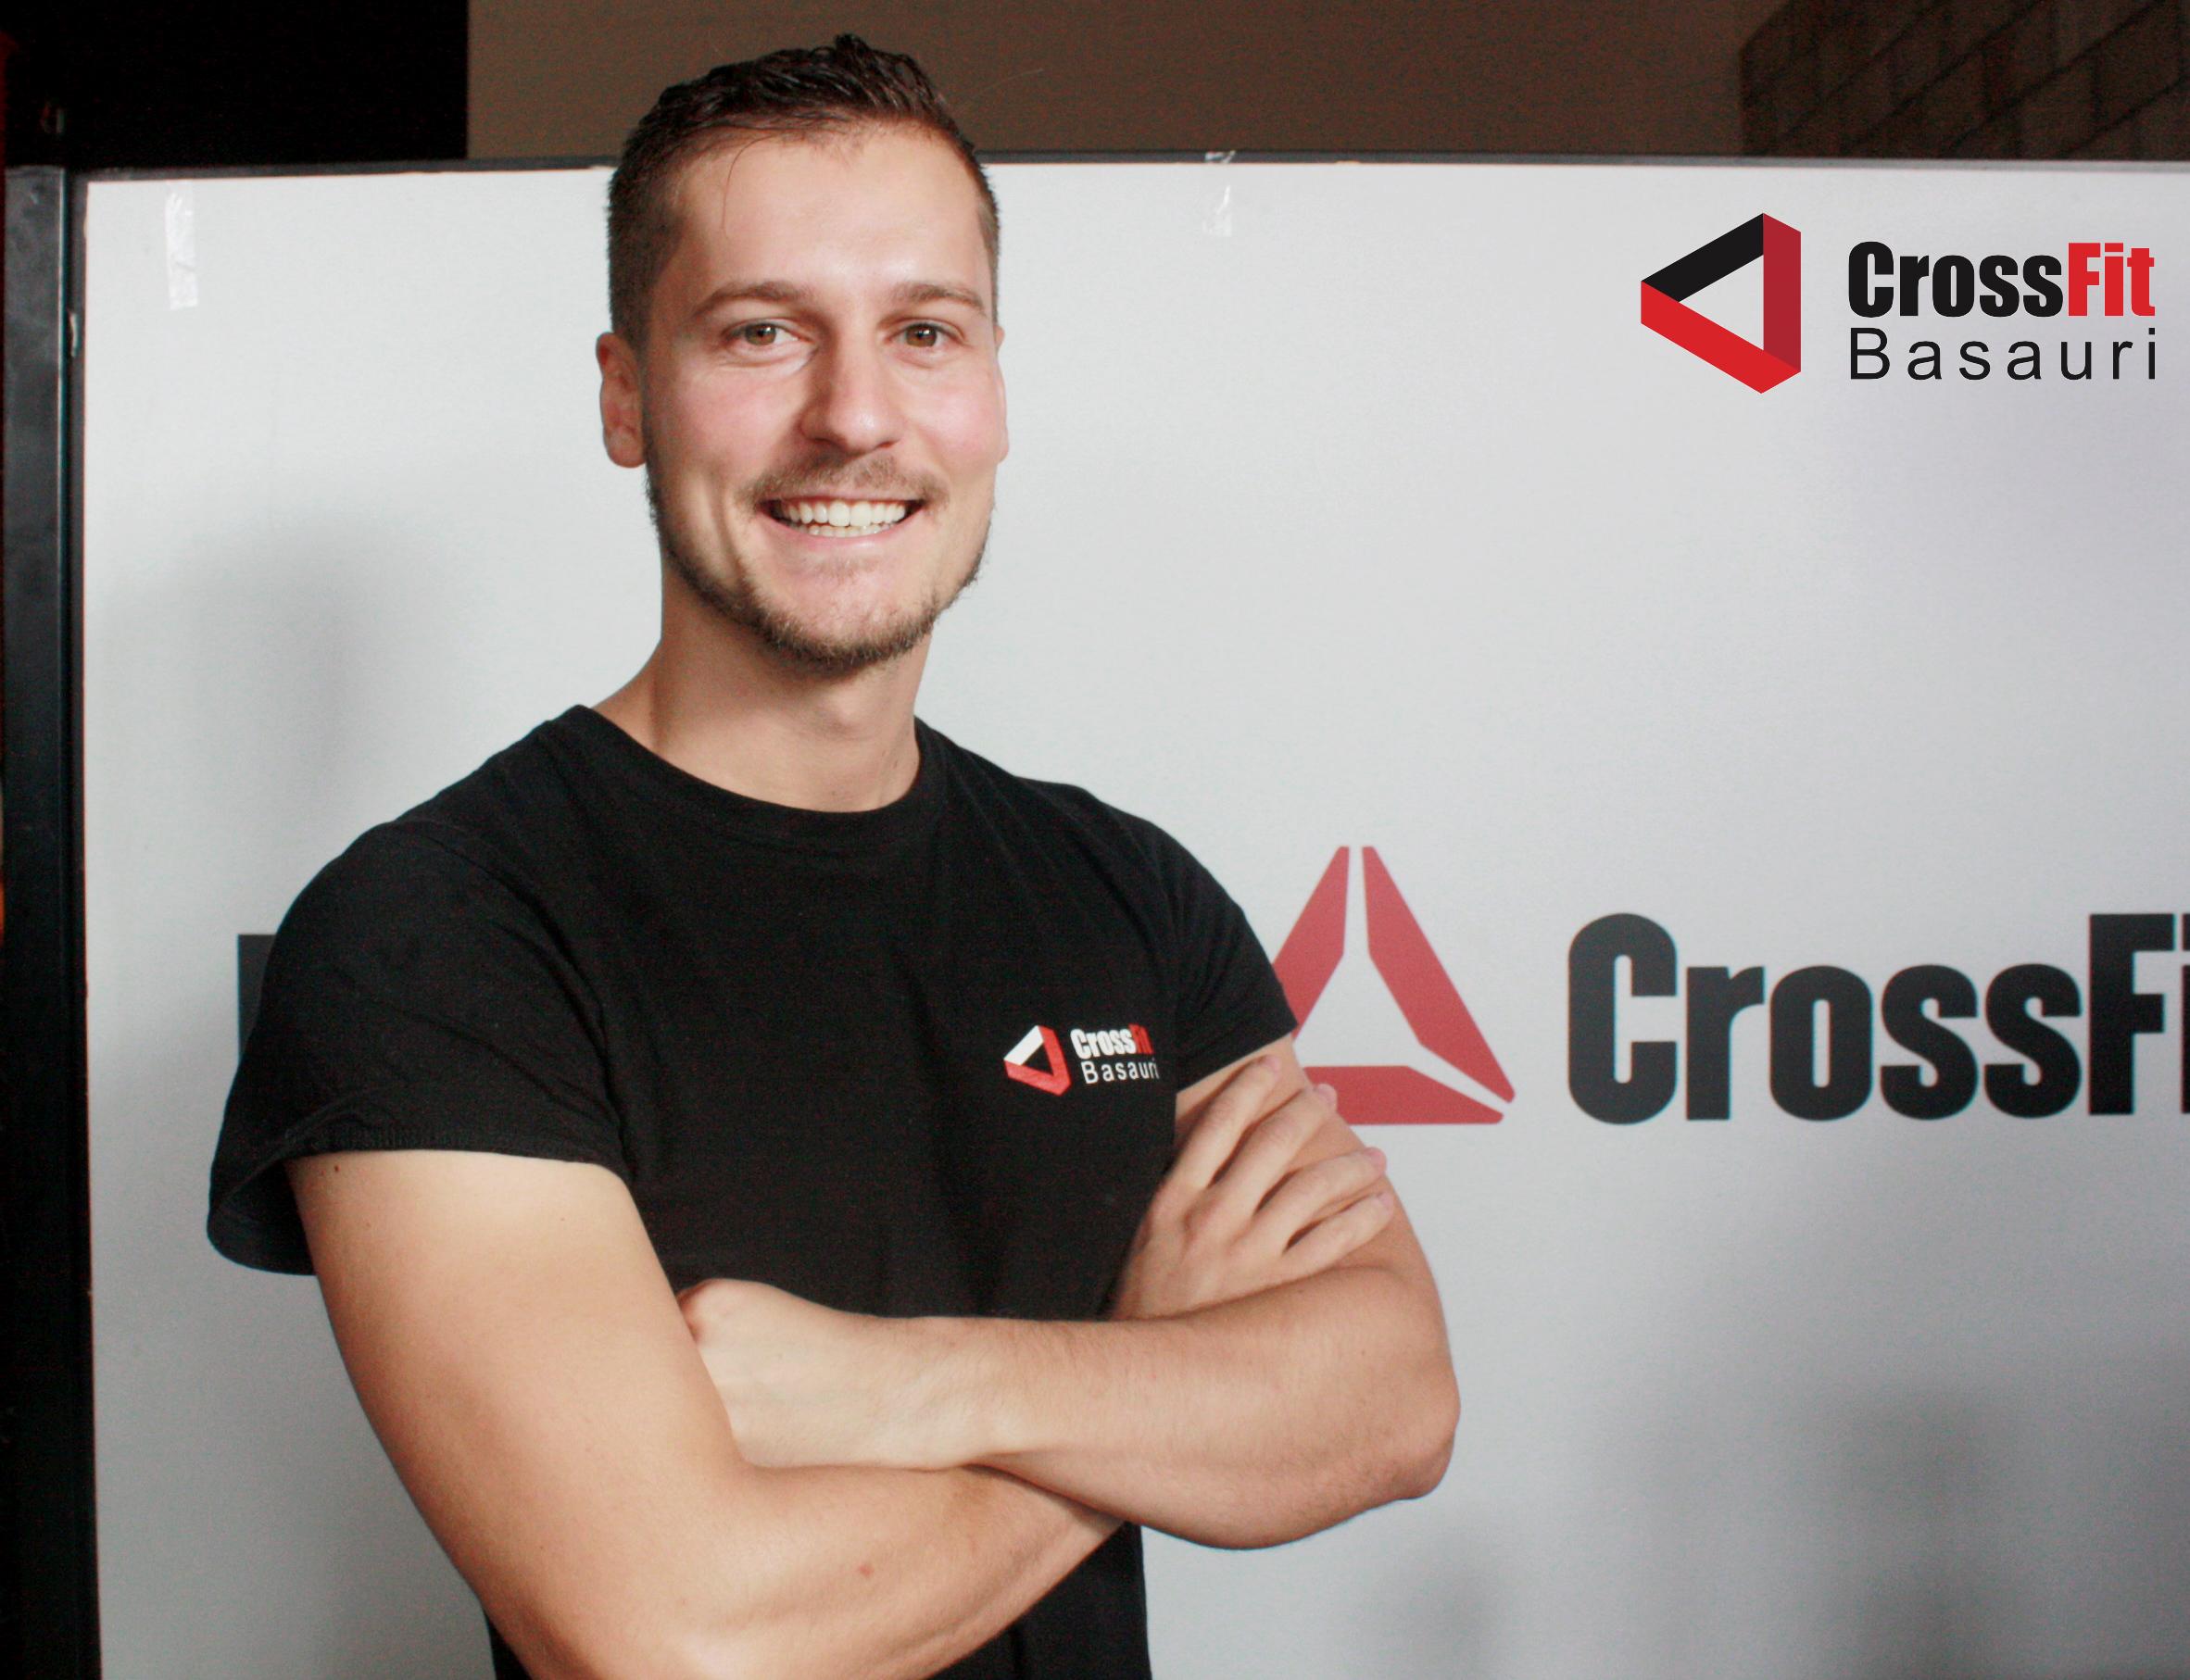 http://crossfitbasauri.com/entrenadores/iker-mate-sanz/